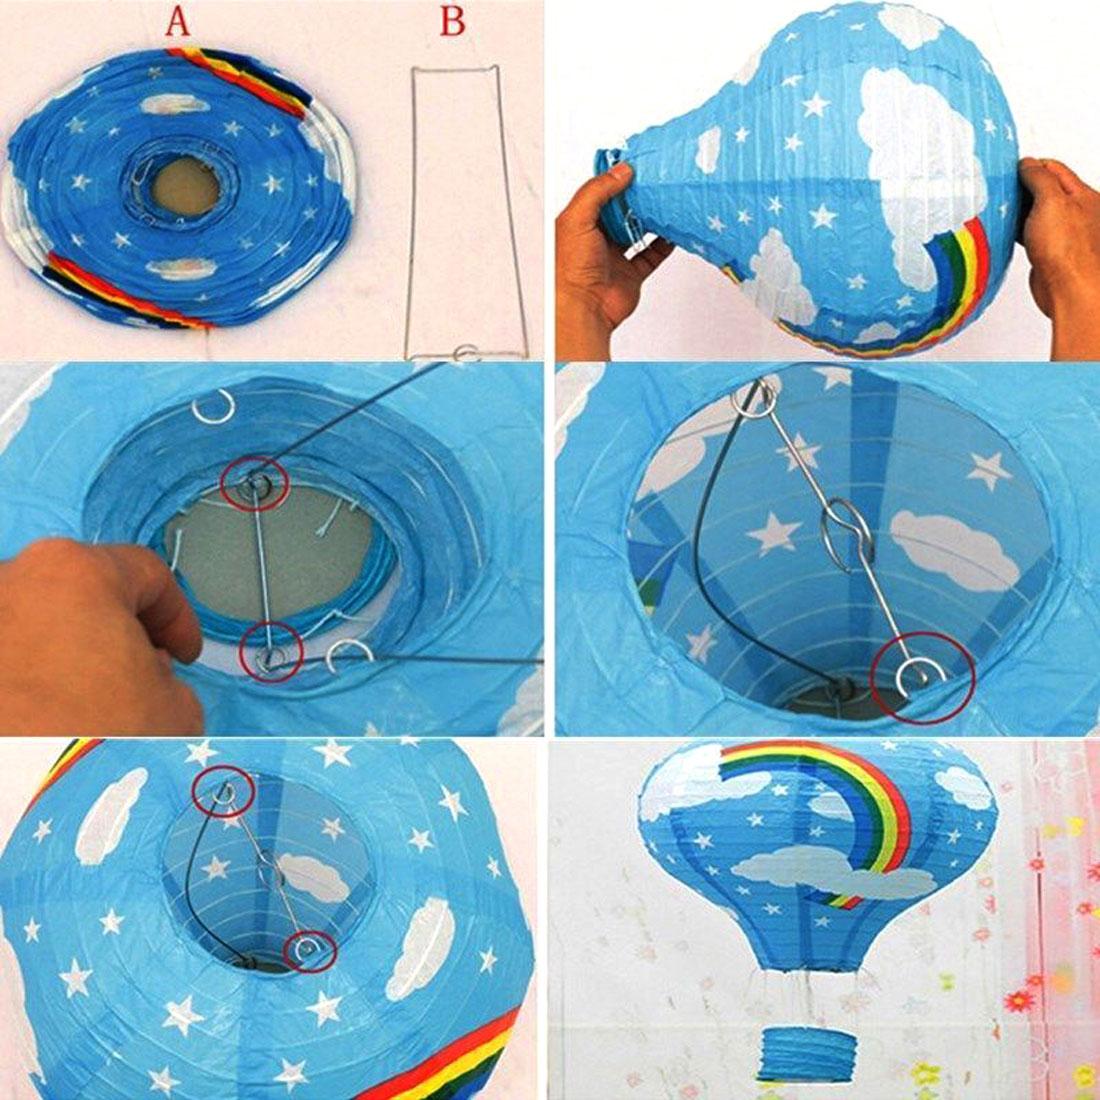 Festival Party Paper DIY Handmade Lightless Hot Air Balloon Lantern Green White - image 1 of 6